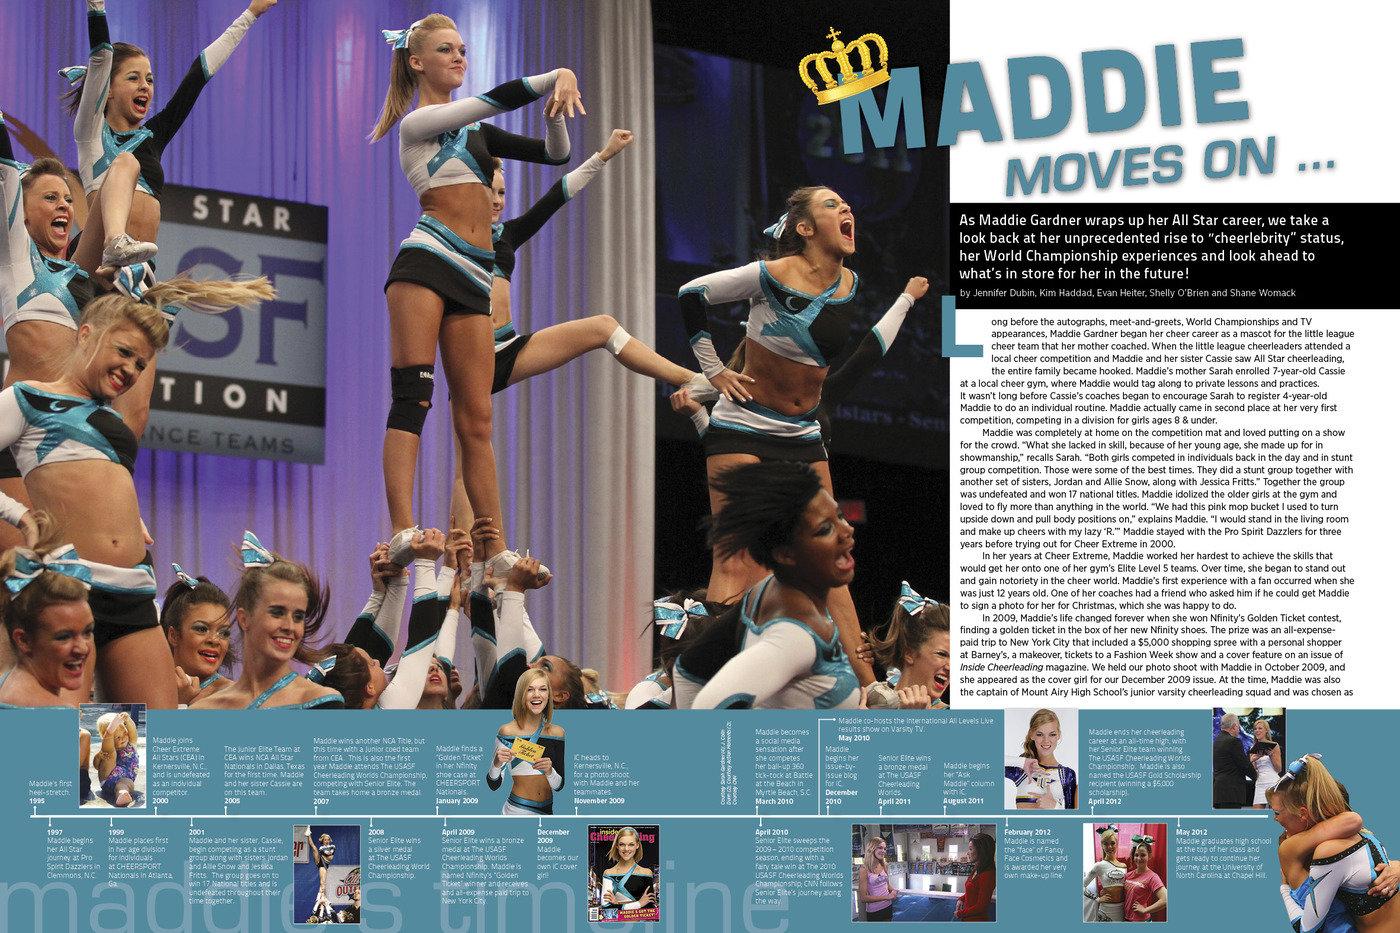 Inside Cheerleading Magazine By Courtney Wilkes Muller At Coroflot